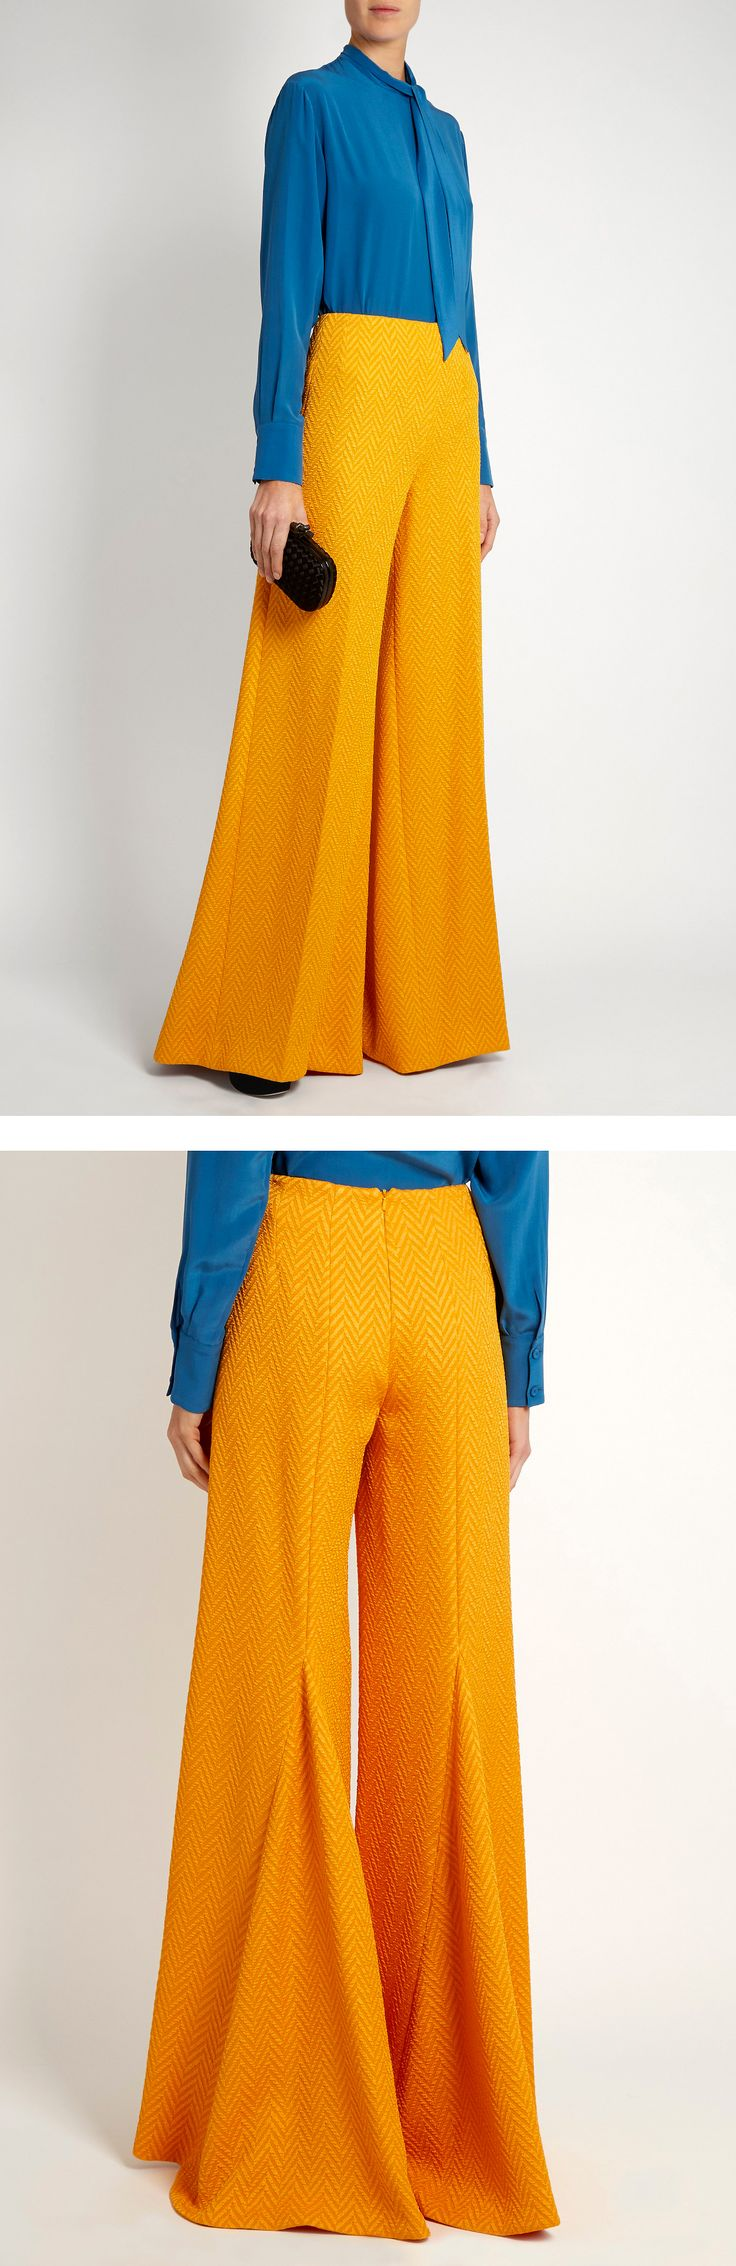 EMILIA WICKSTEAD Rodeo chevron-matelassé wide-leg trousers with fluttering godets